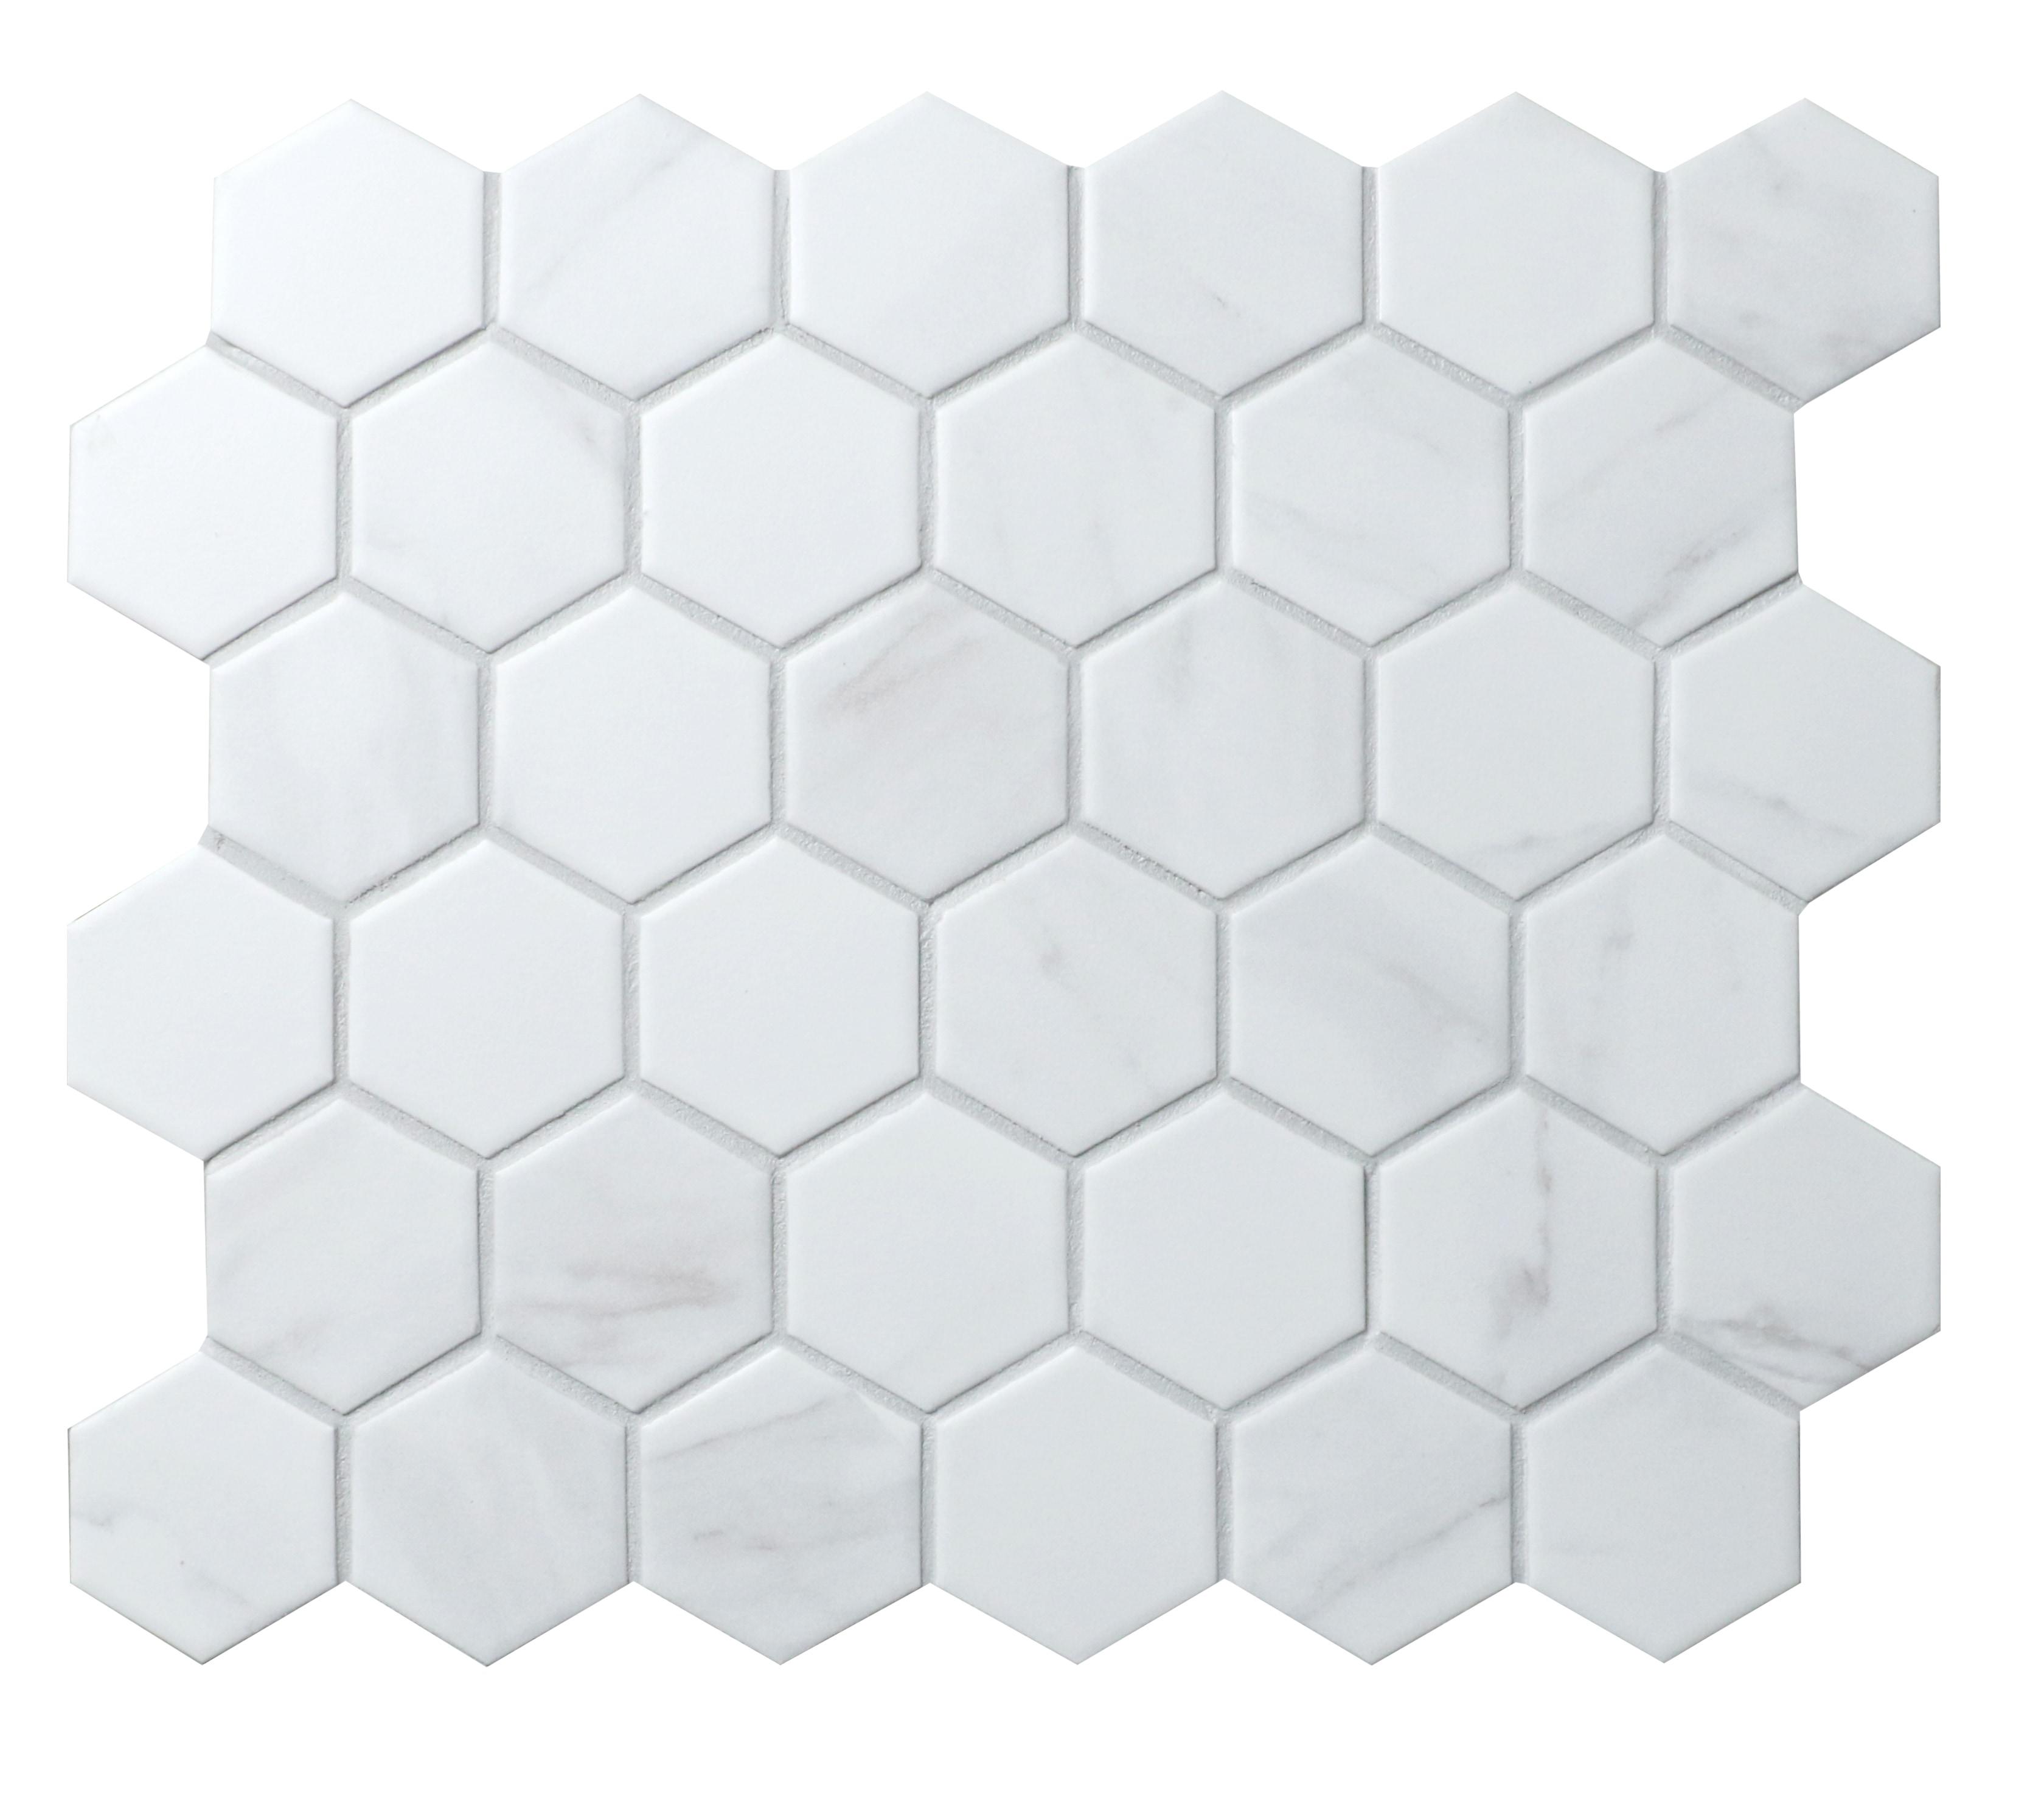 "11 x 10.5 x 0.24 inches / Matte Retro 2"" Hexagon Porcelain Matte Floor and Wall Tile in Carrara 0"